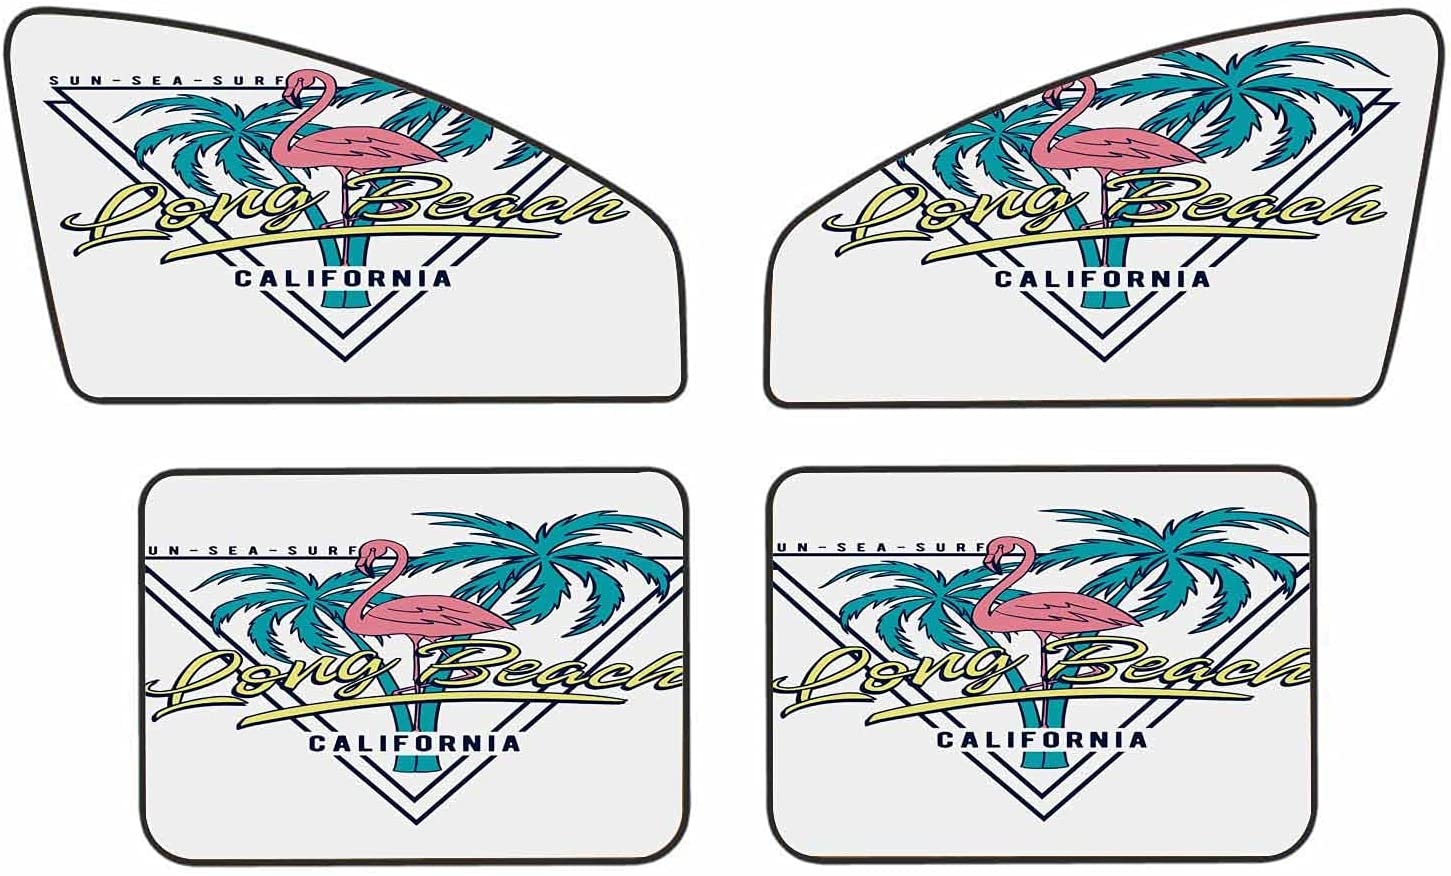 WONDERTIFY Flamingo Car Sun Shades Long Beach Max 62% OFF Gorgeous Elements Tropical